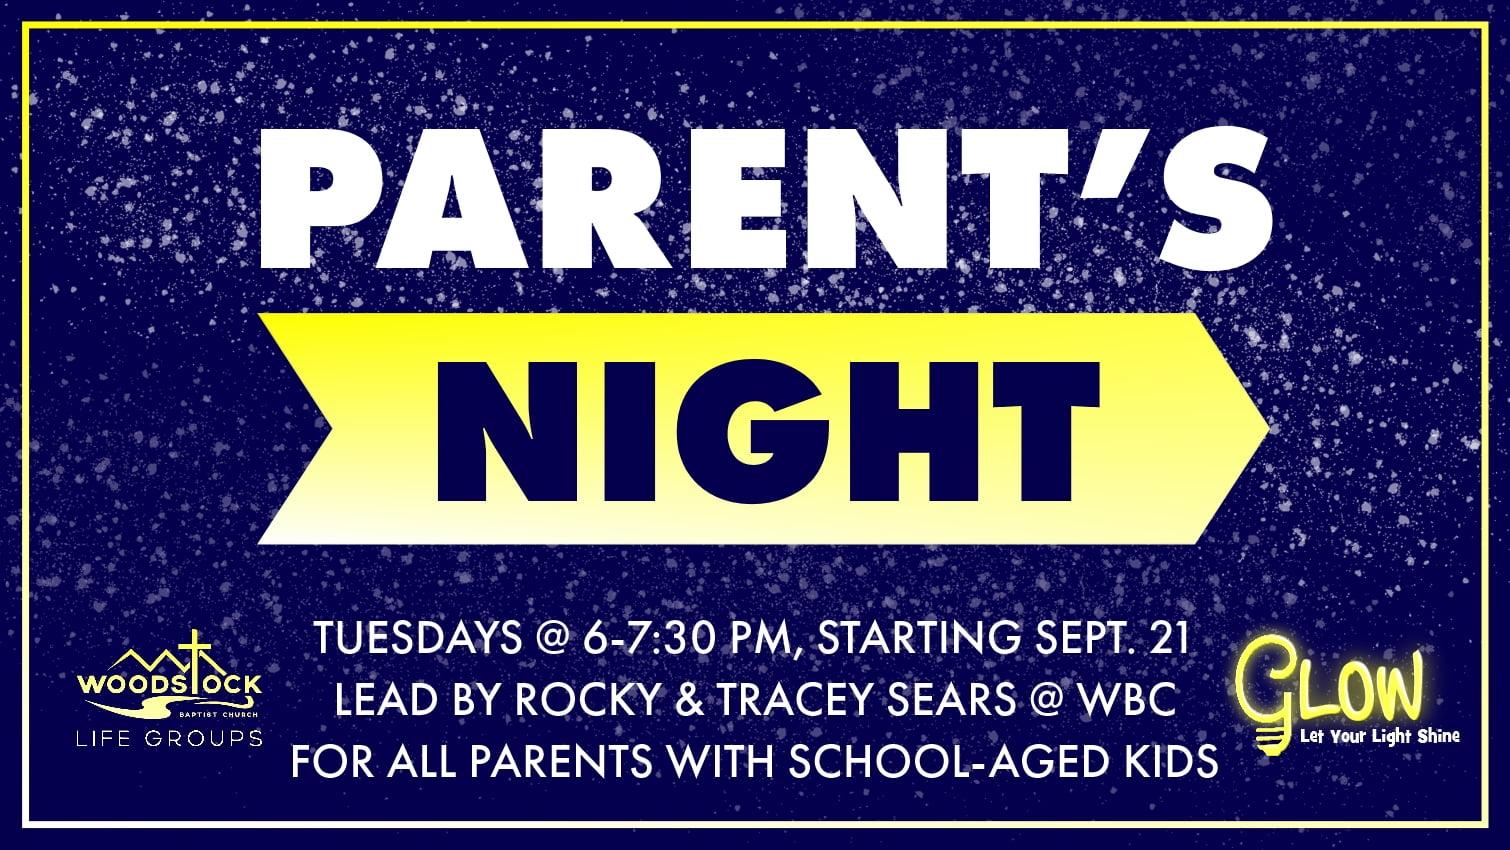 Parent's Night L.G. starting - screen